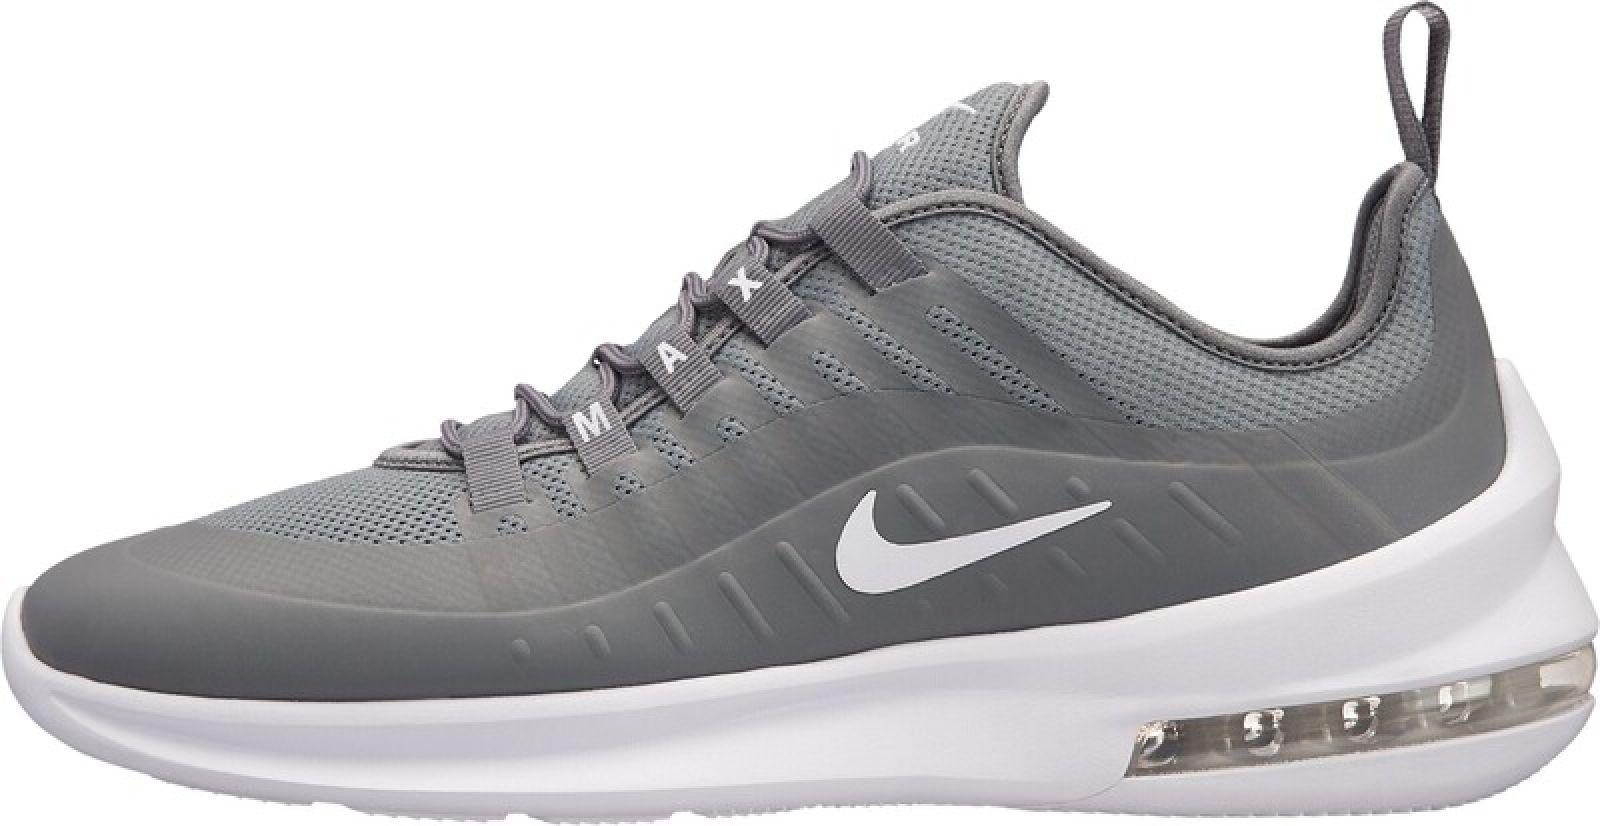 Details zu NIKE Herren Freizeitschuhe Sportschuhe Trend Schuhe Sneaker AIR MAX Axis grau